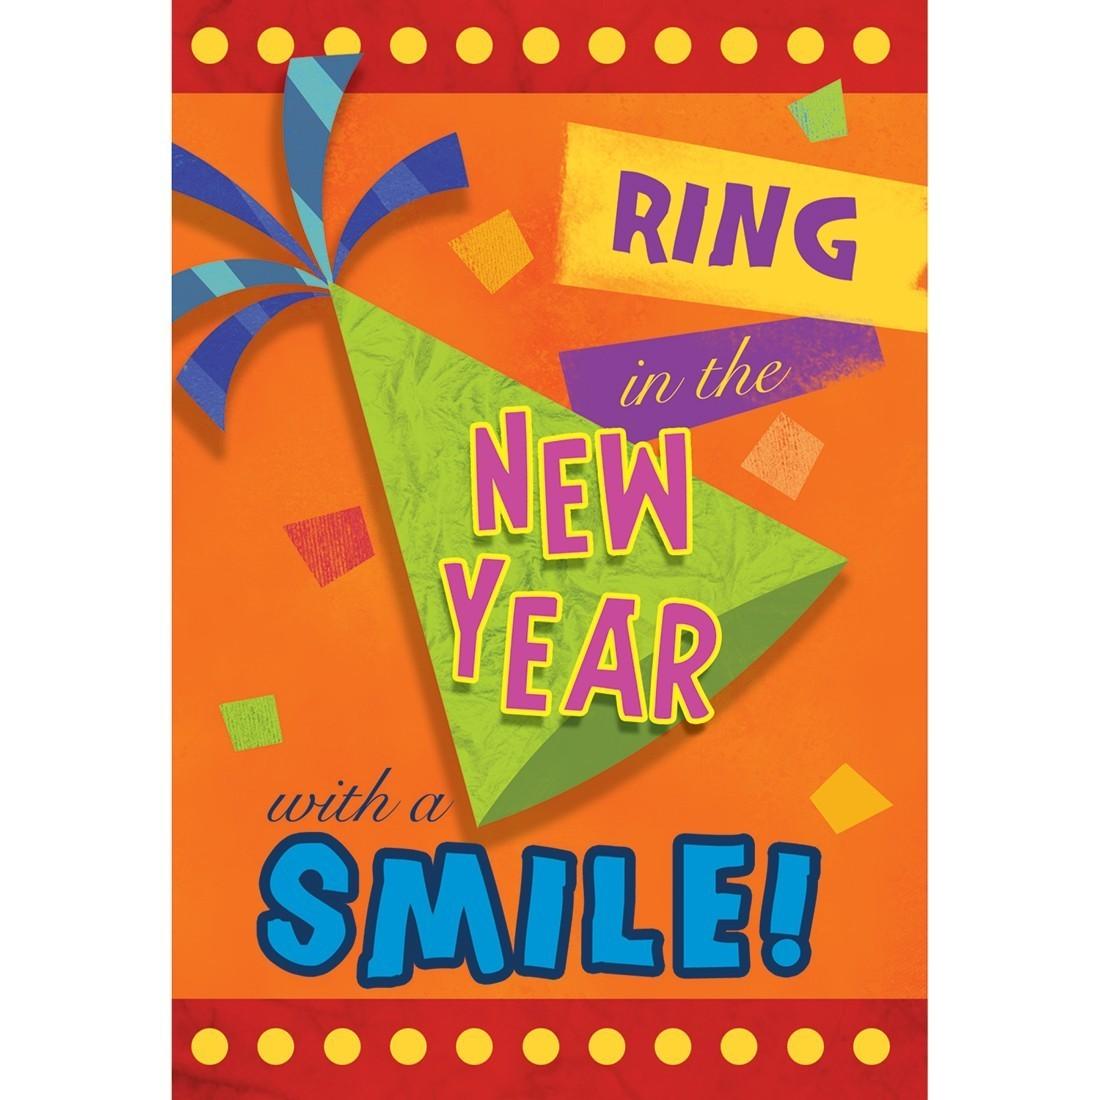 100 new year smile greeting cards dental greeting cards from new year smile greeting cards m4hsunfo